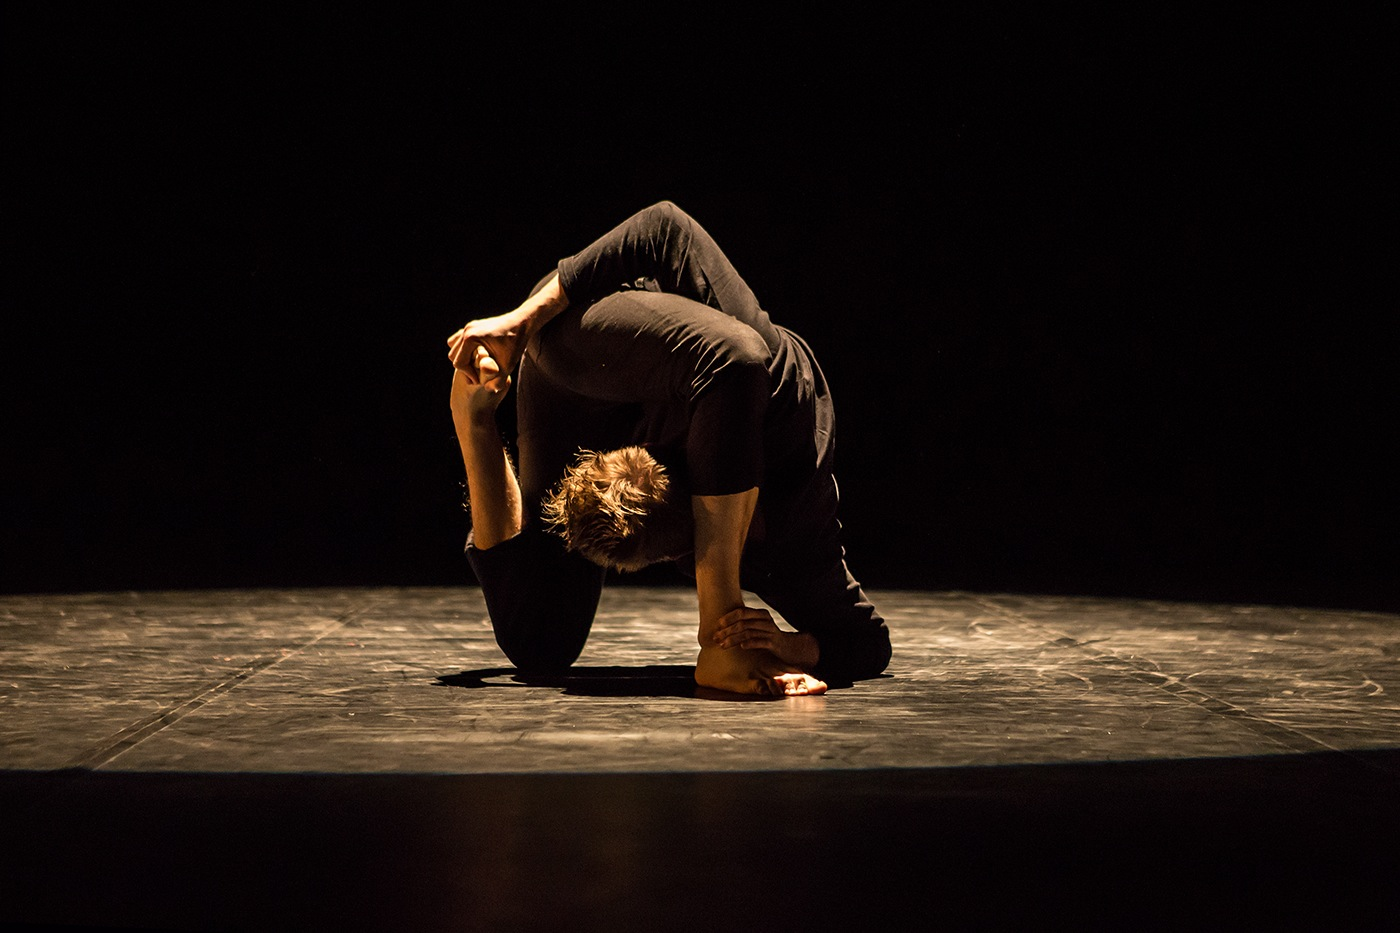 photographe-reportage-danse-avec-ton-crous-guillaume-heraud-022-small